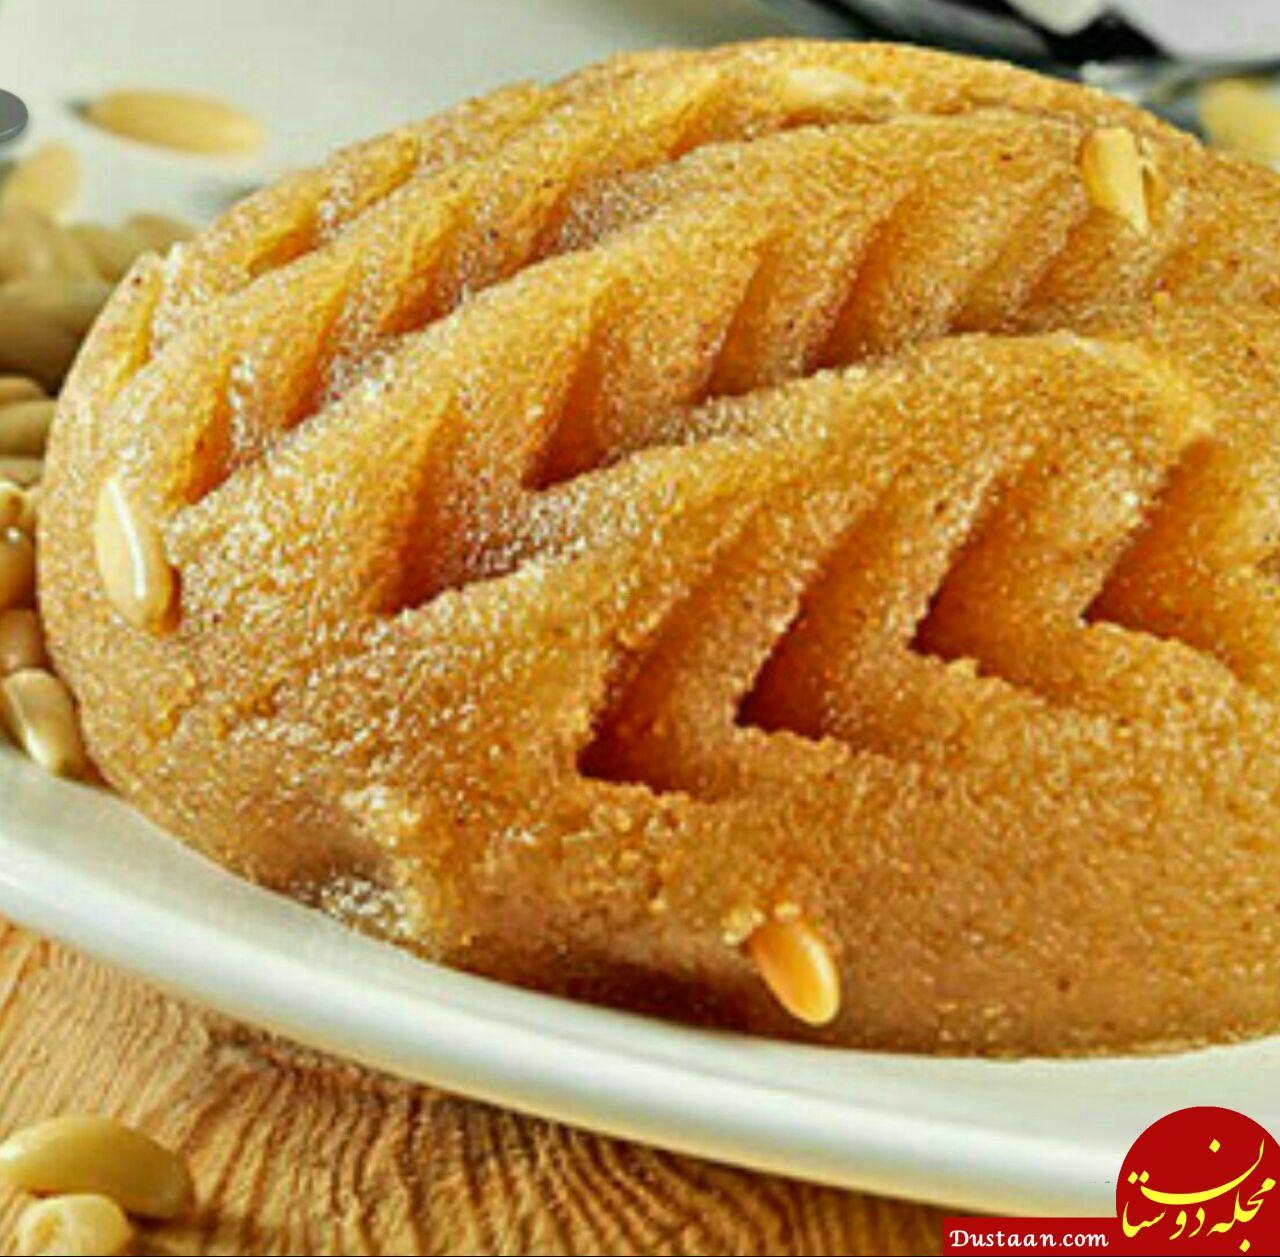 www.dustaan.com طرز تهیه حلوای ایرمیک یا حلوای سمولینا به سبکی خوشمزه